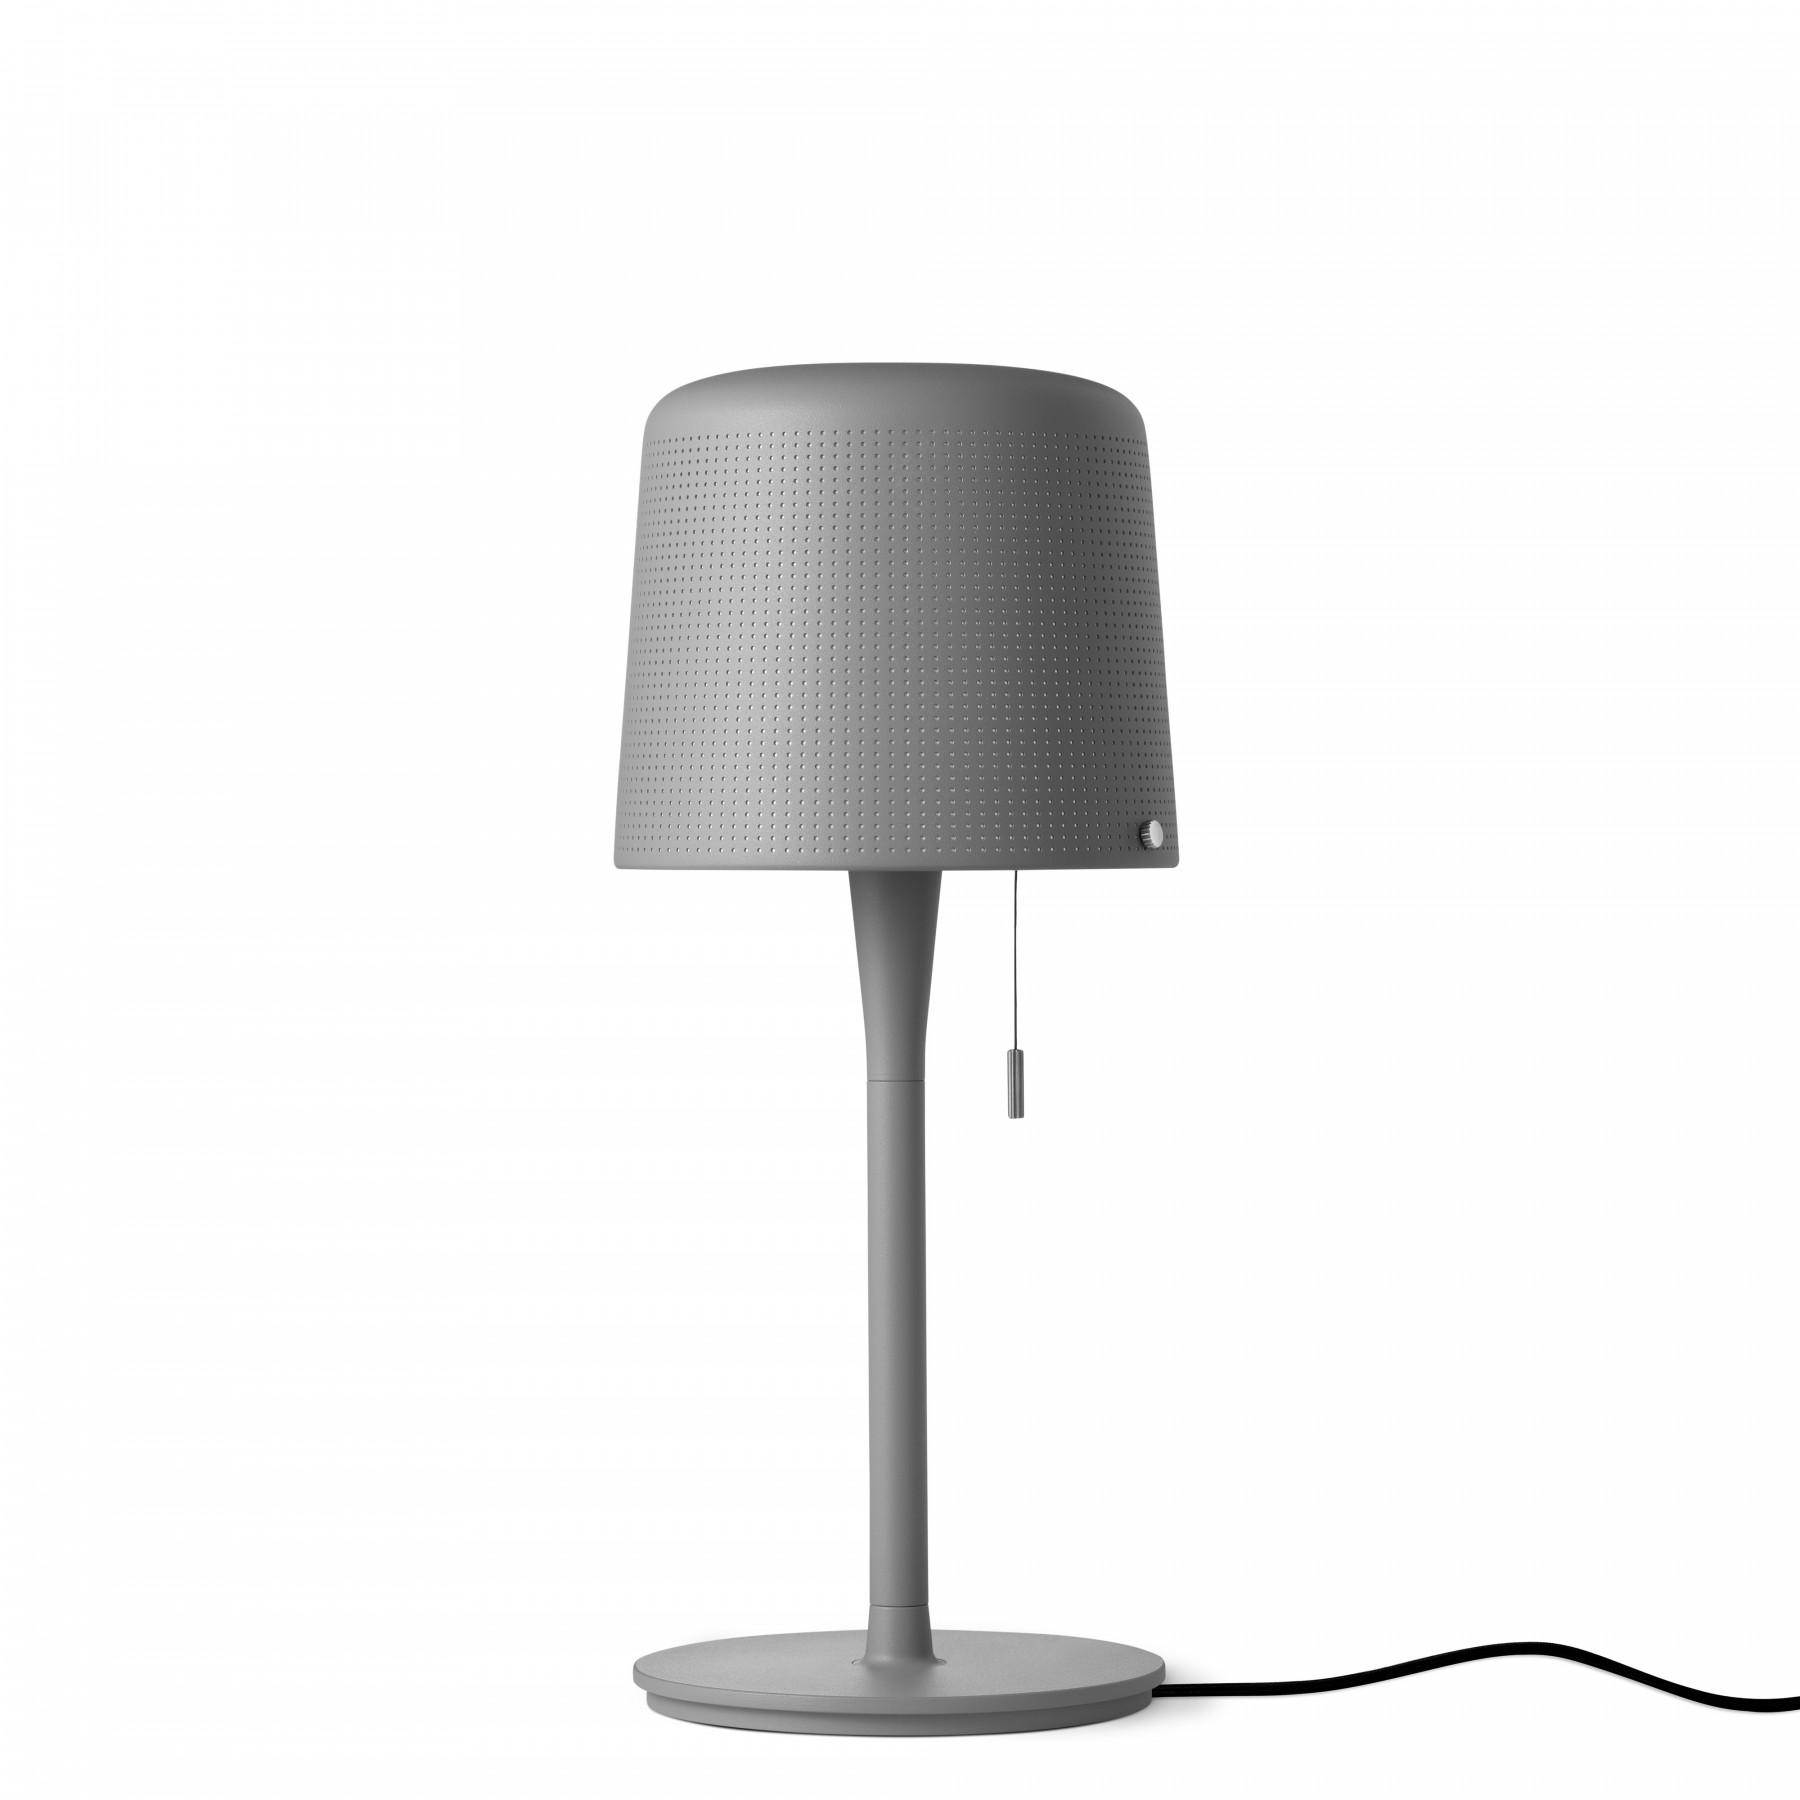 vipp Table Lamp Light Grey VIPP530, 53001EU, 5705953168283